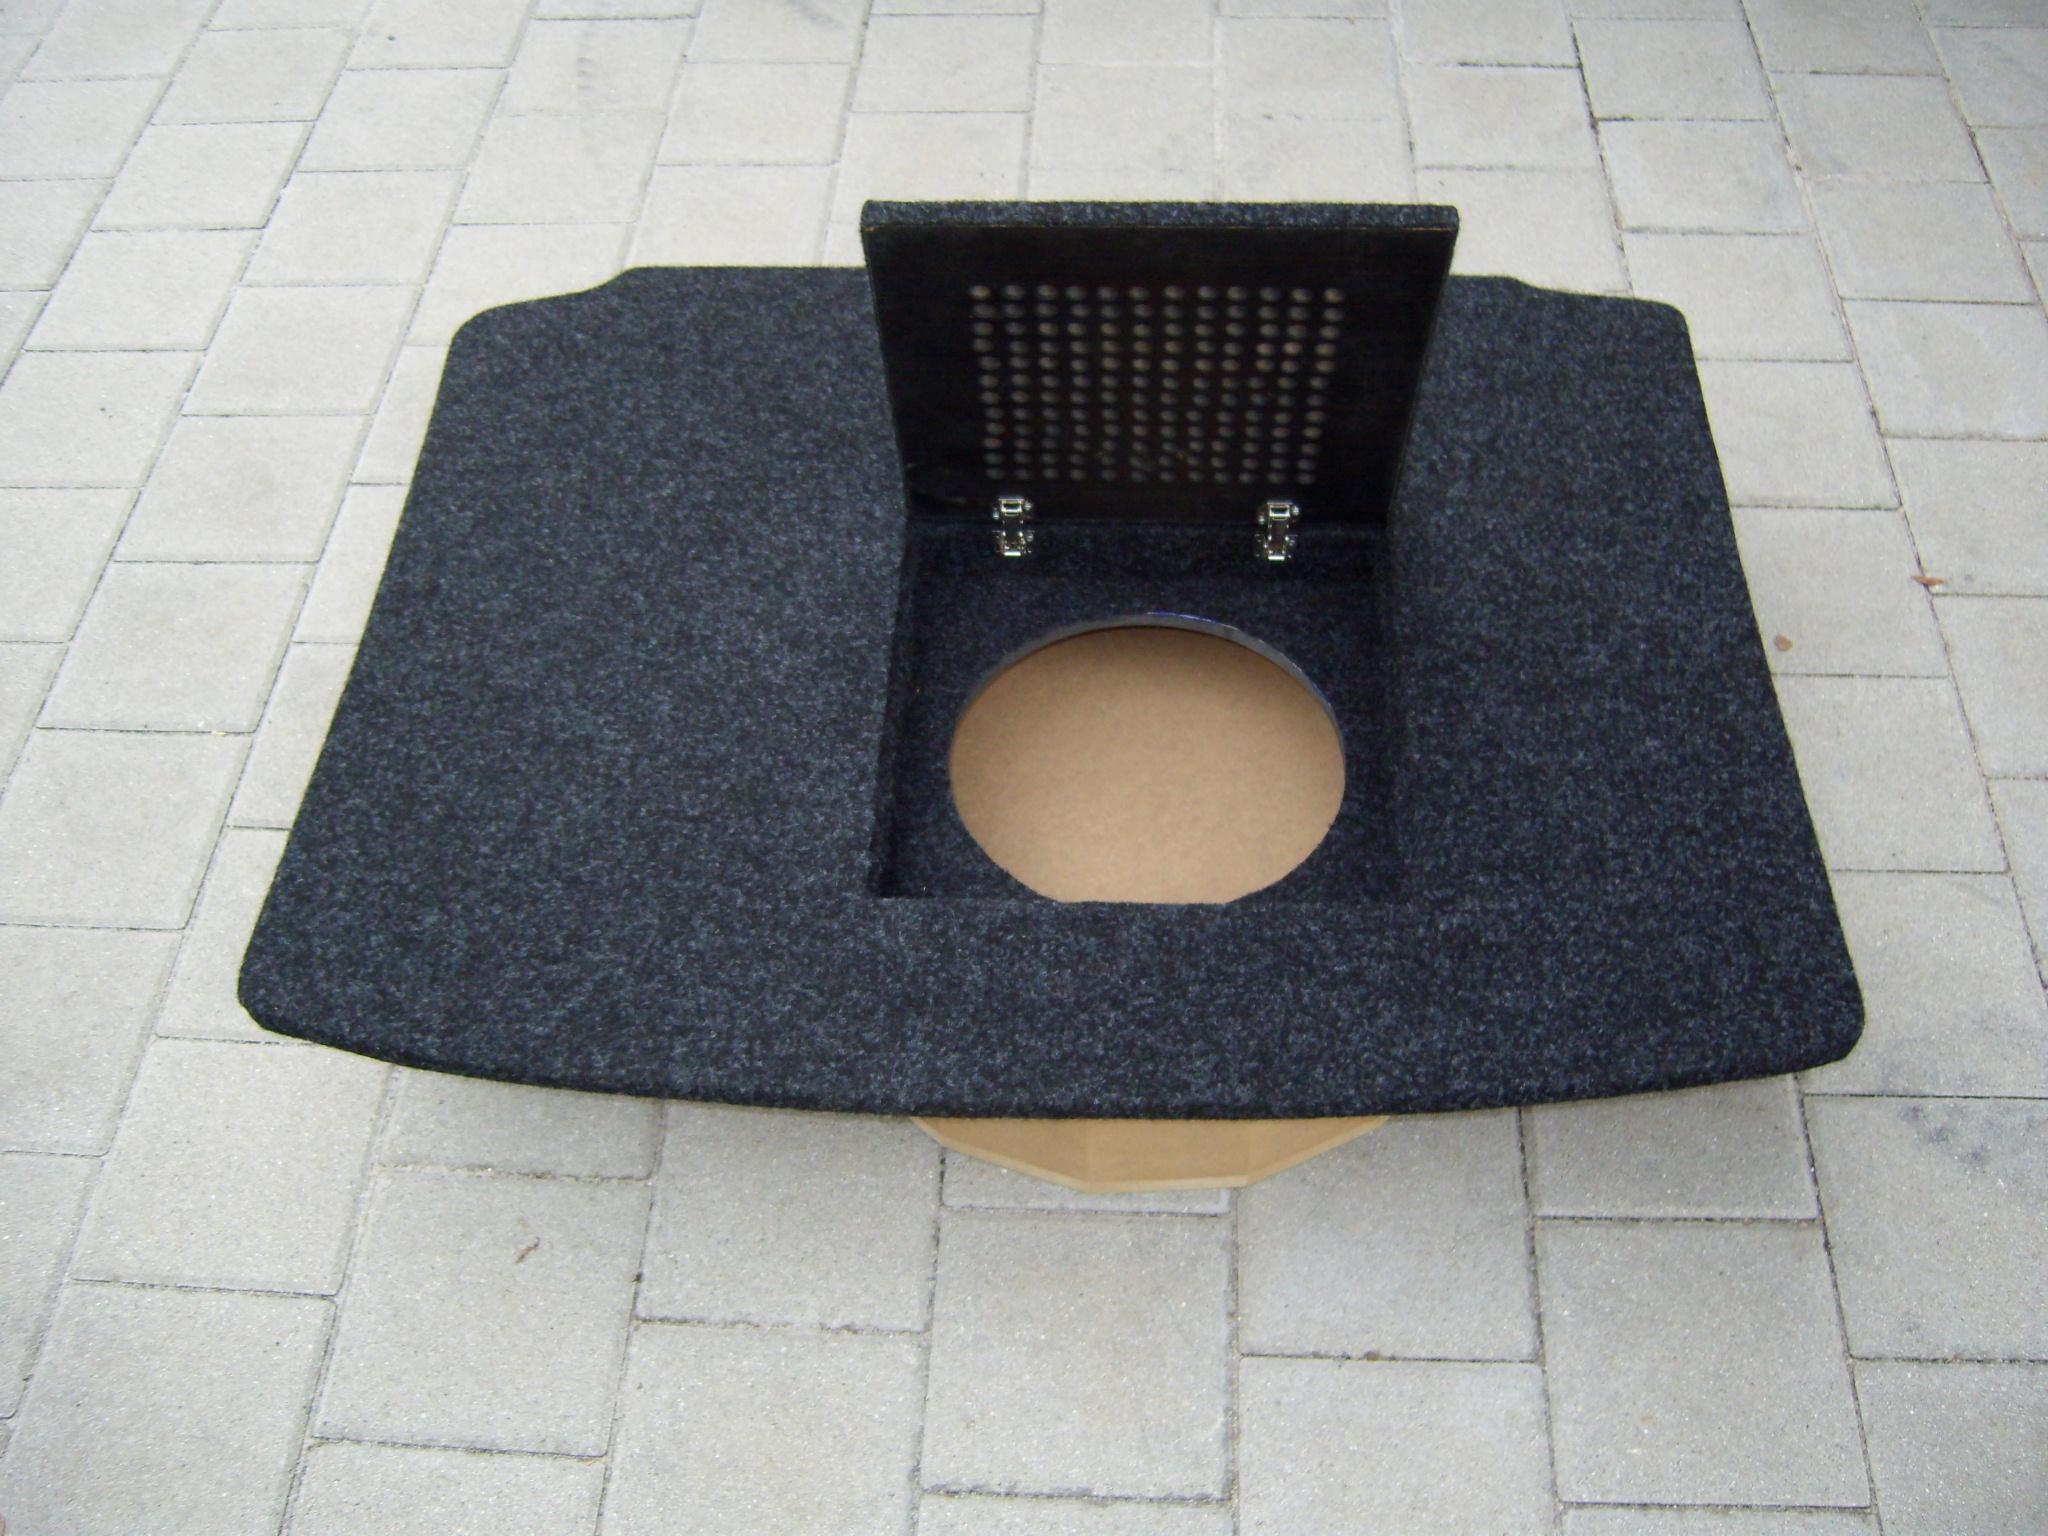 komplettausbau kofferraumausbau vw polo 6n 2. Black Bedroom Furniture Sets. Home Design Ideas